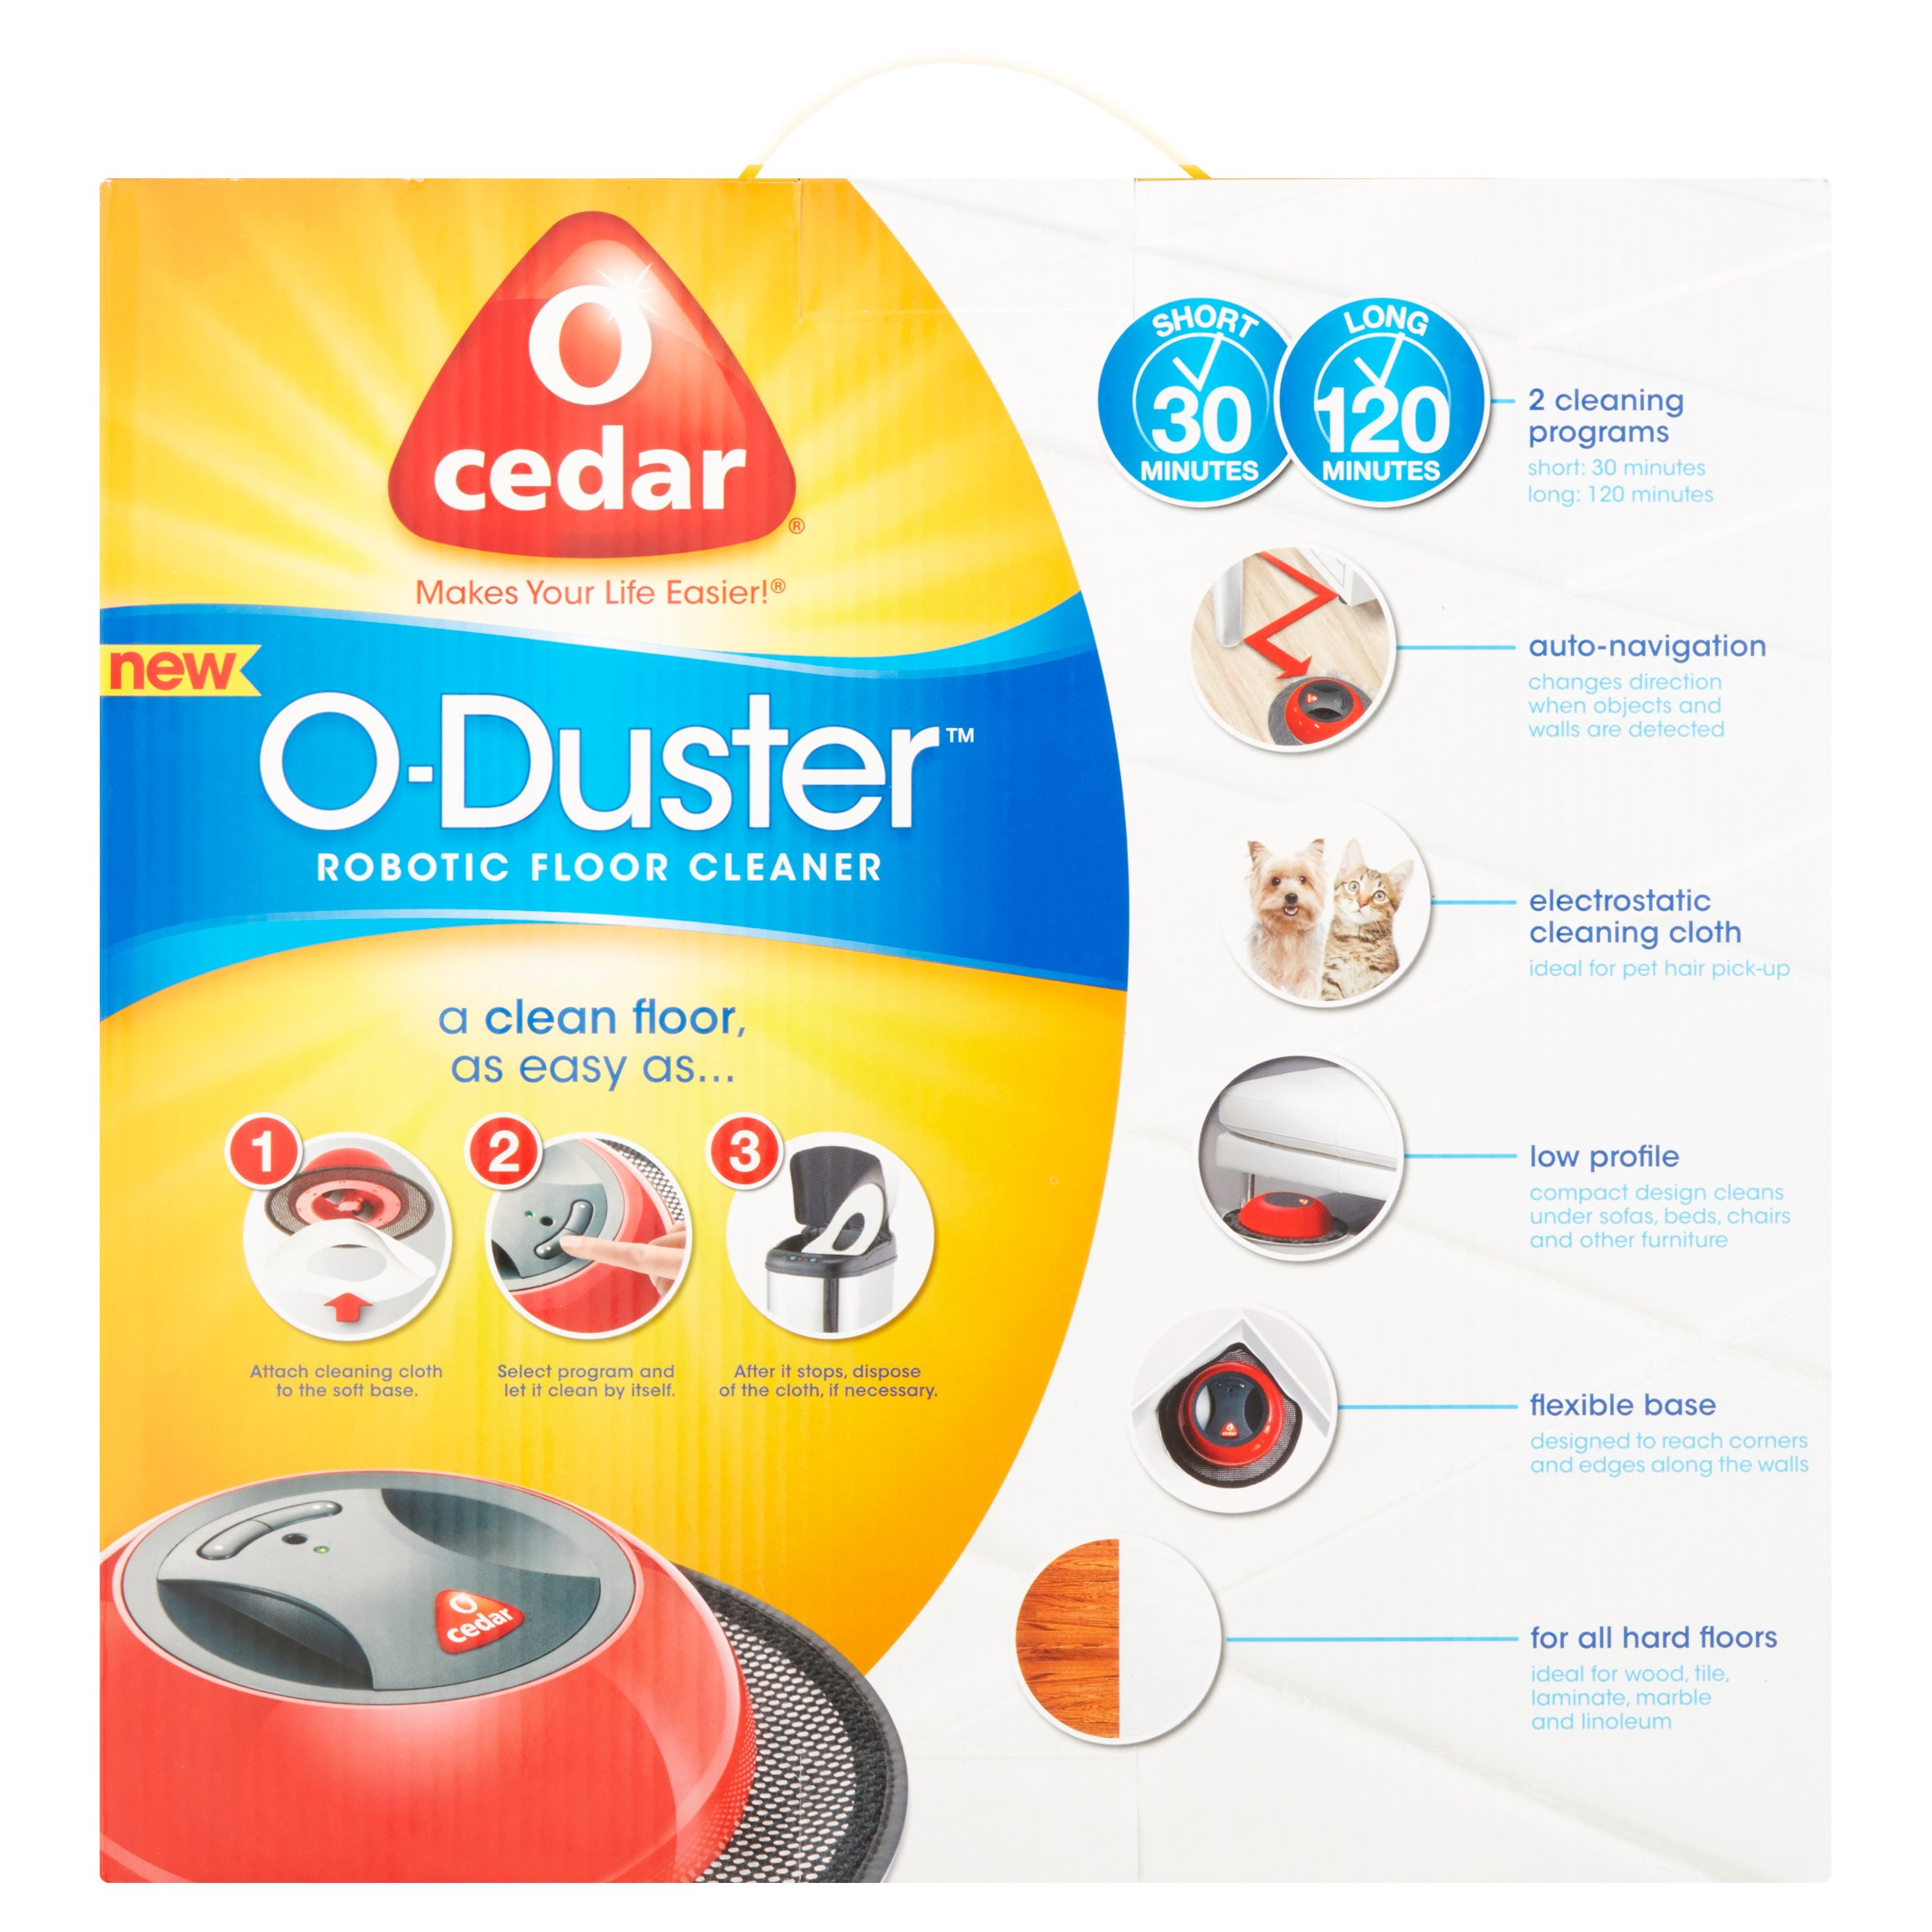 o-cedar o-duster robotic floor cleaner - walmart